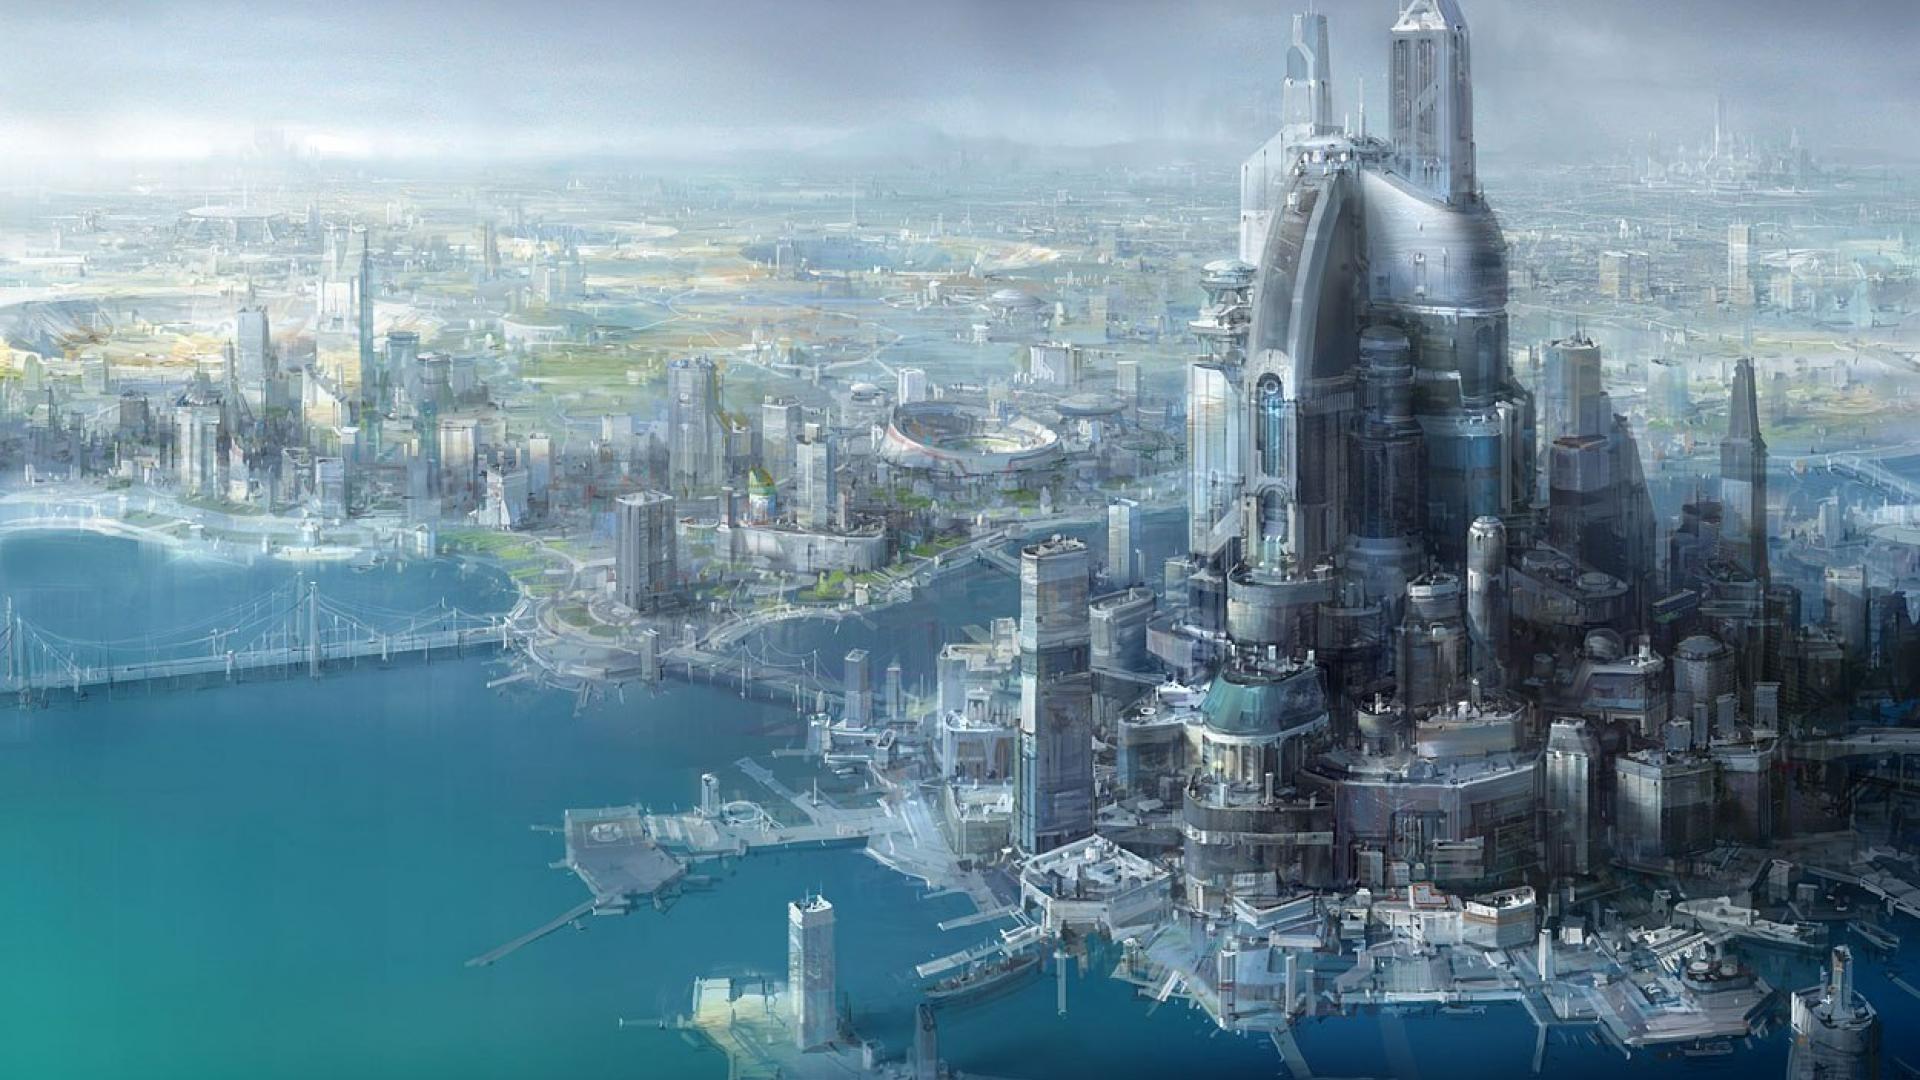 desktop images: future city wallpapers, future city wallpapers